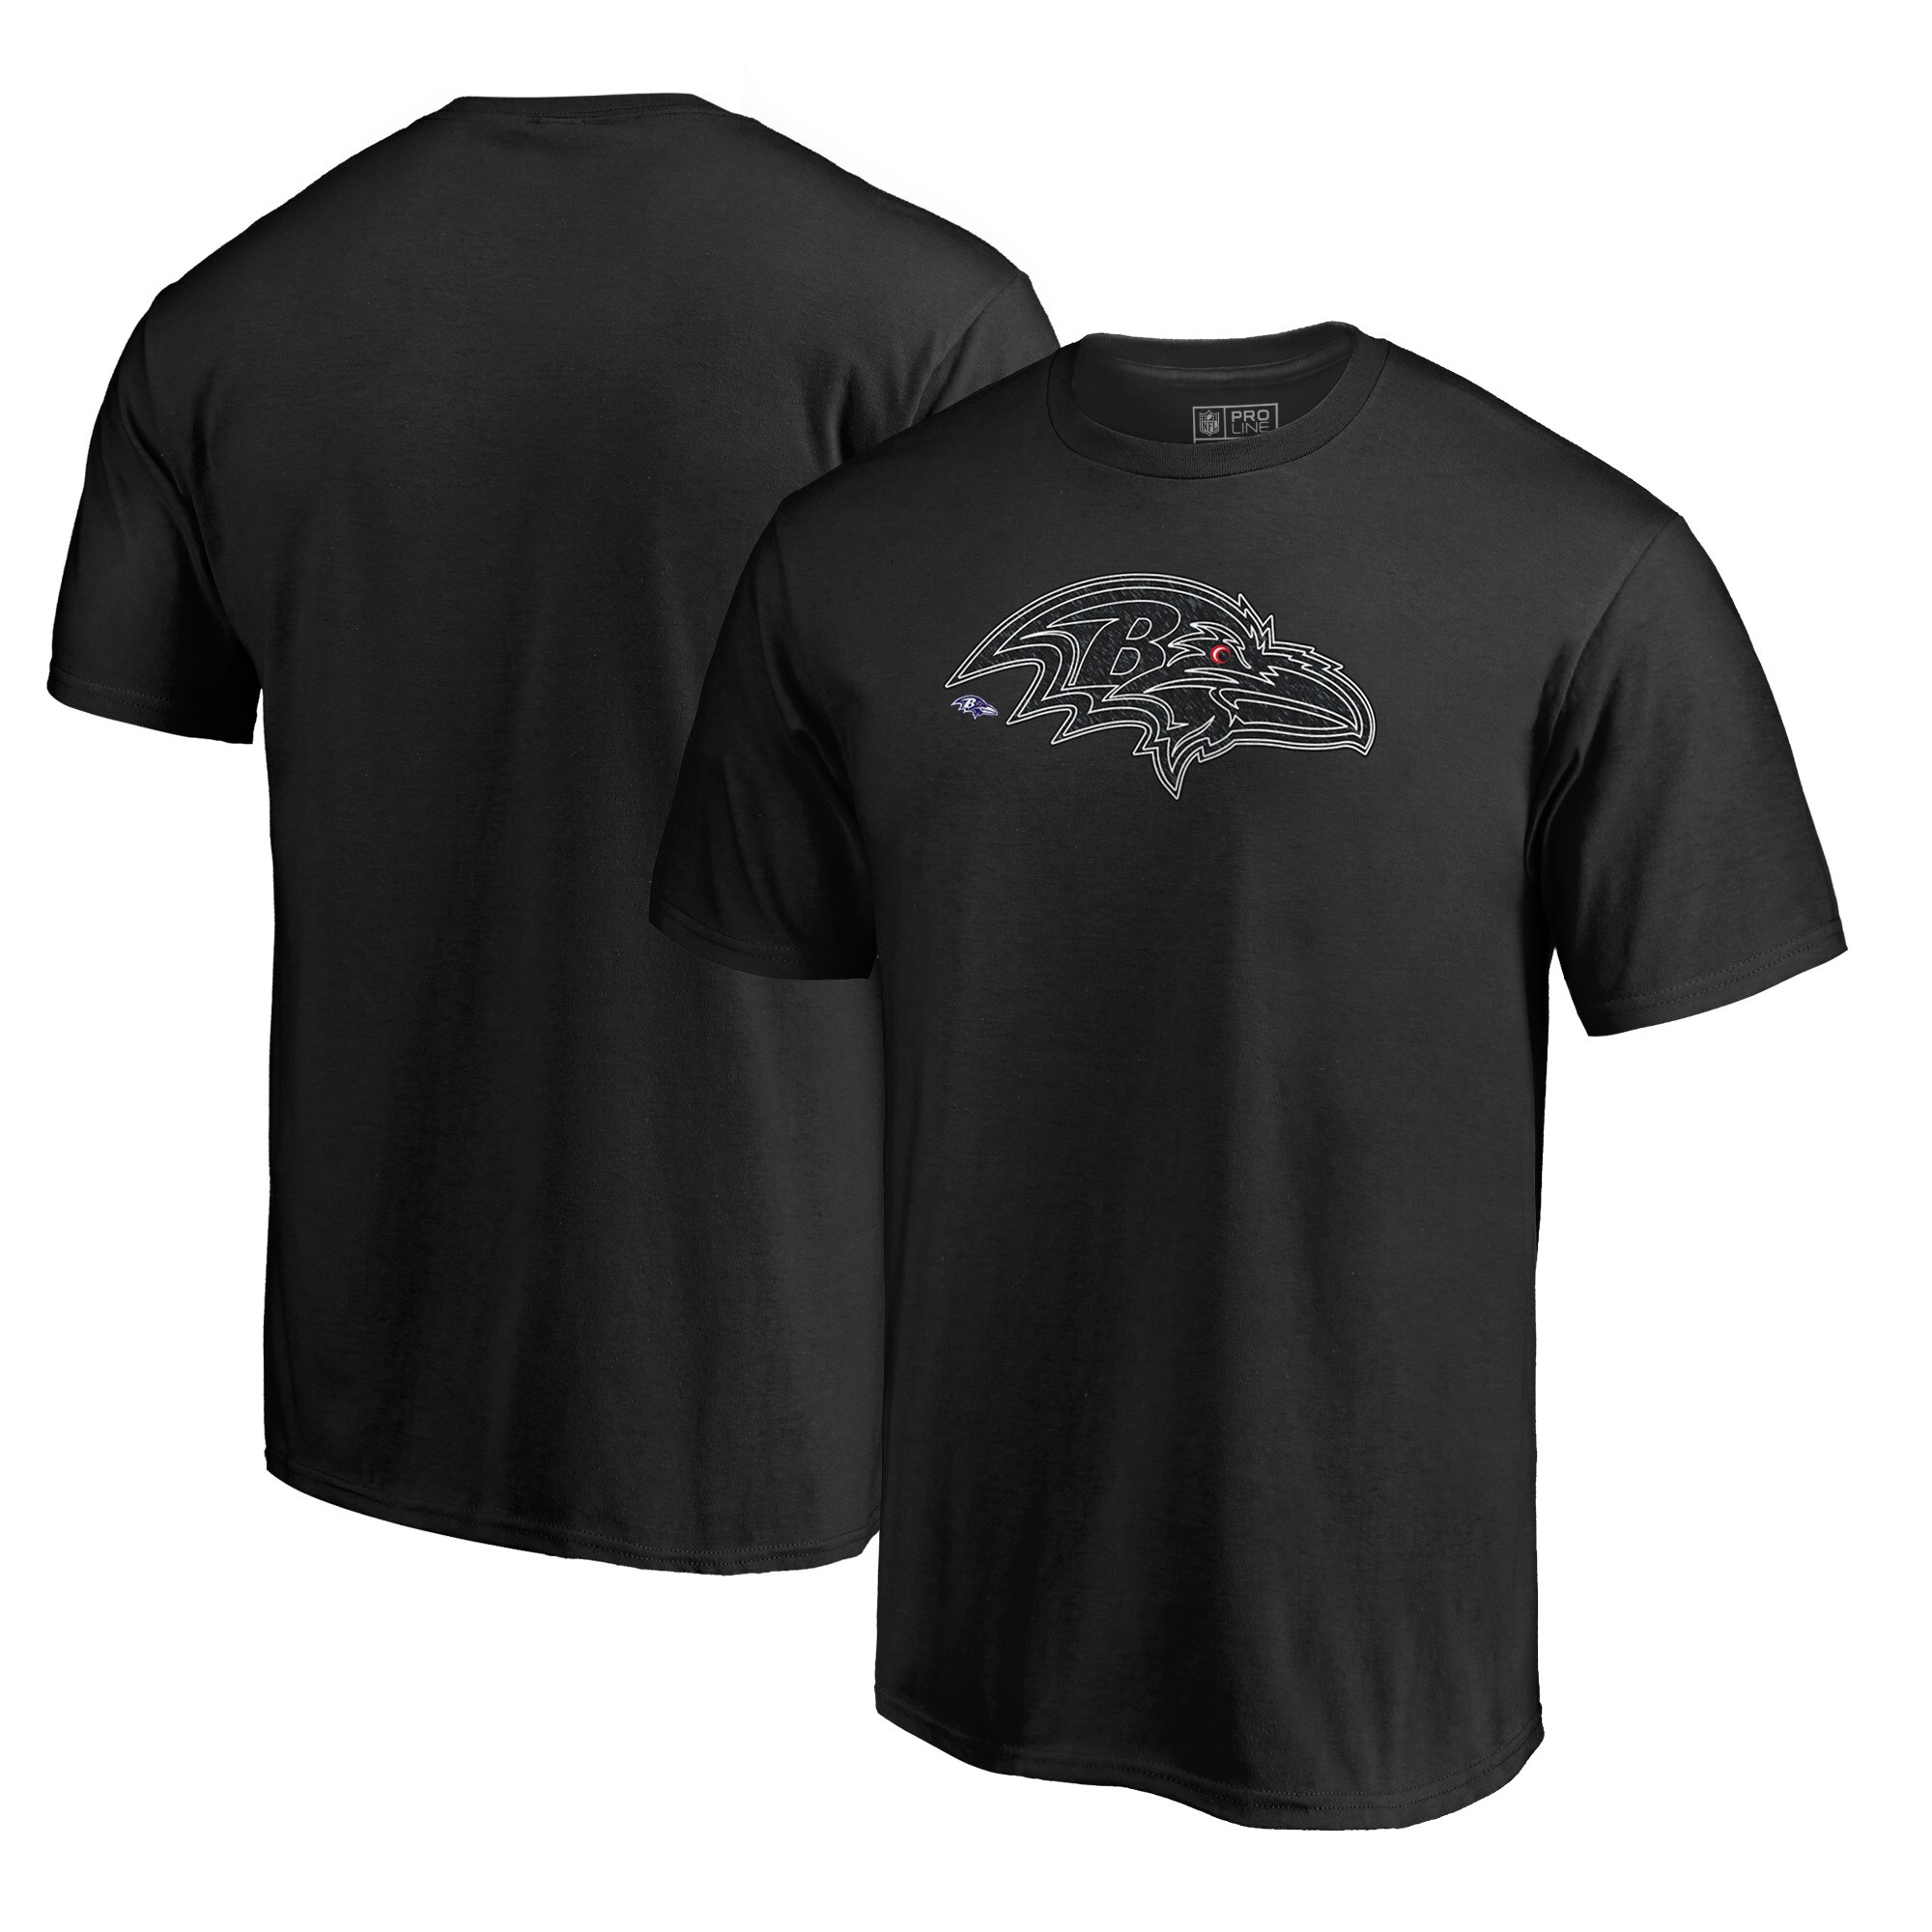 Baltimore Ravens NFL Pro Line by Fanatics Branded Training Camp Hookup T-Shirt - Black